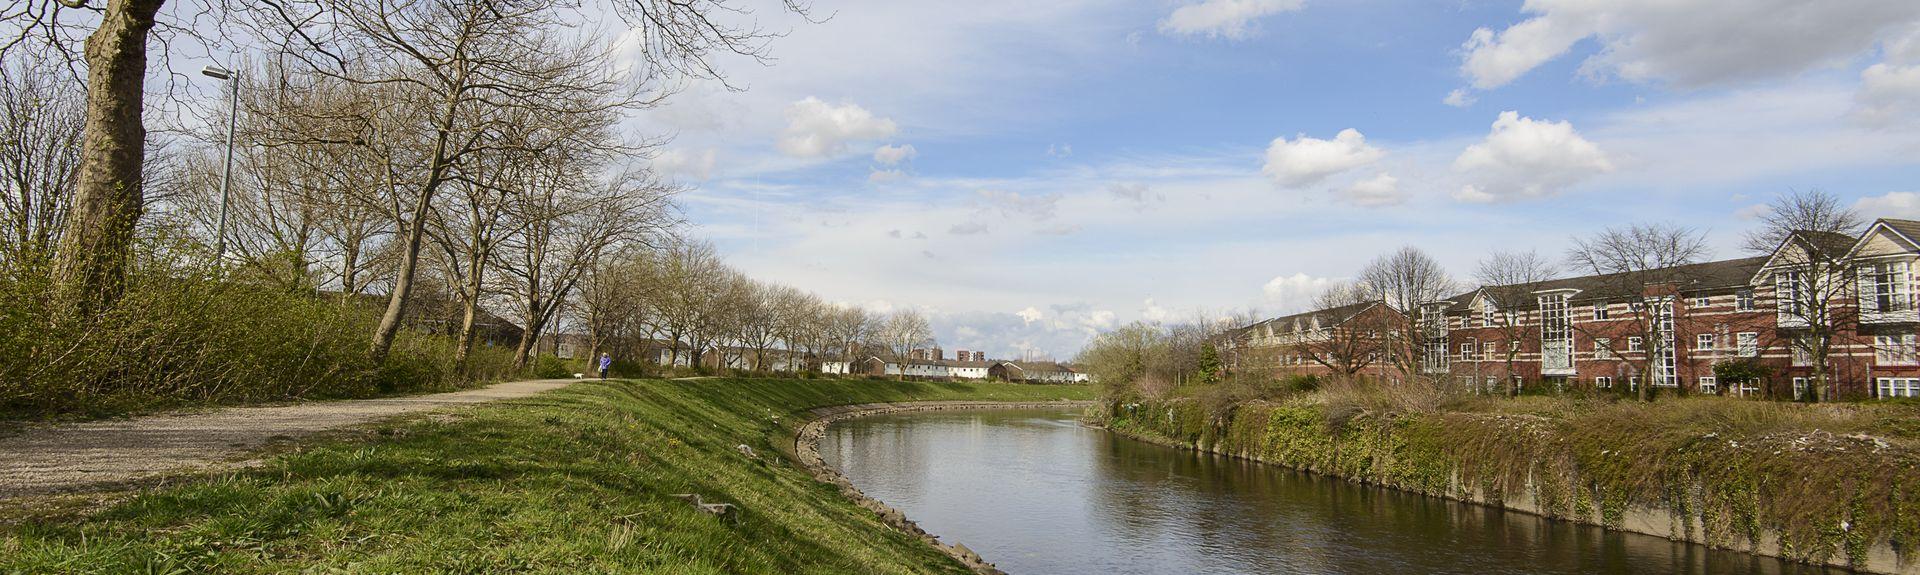 Bramhall, England, UK